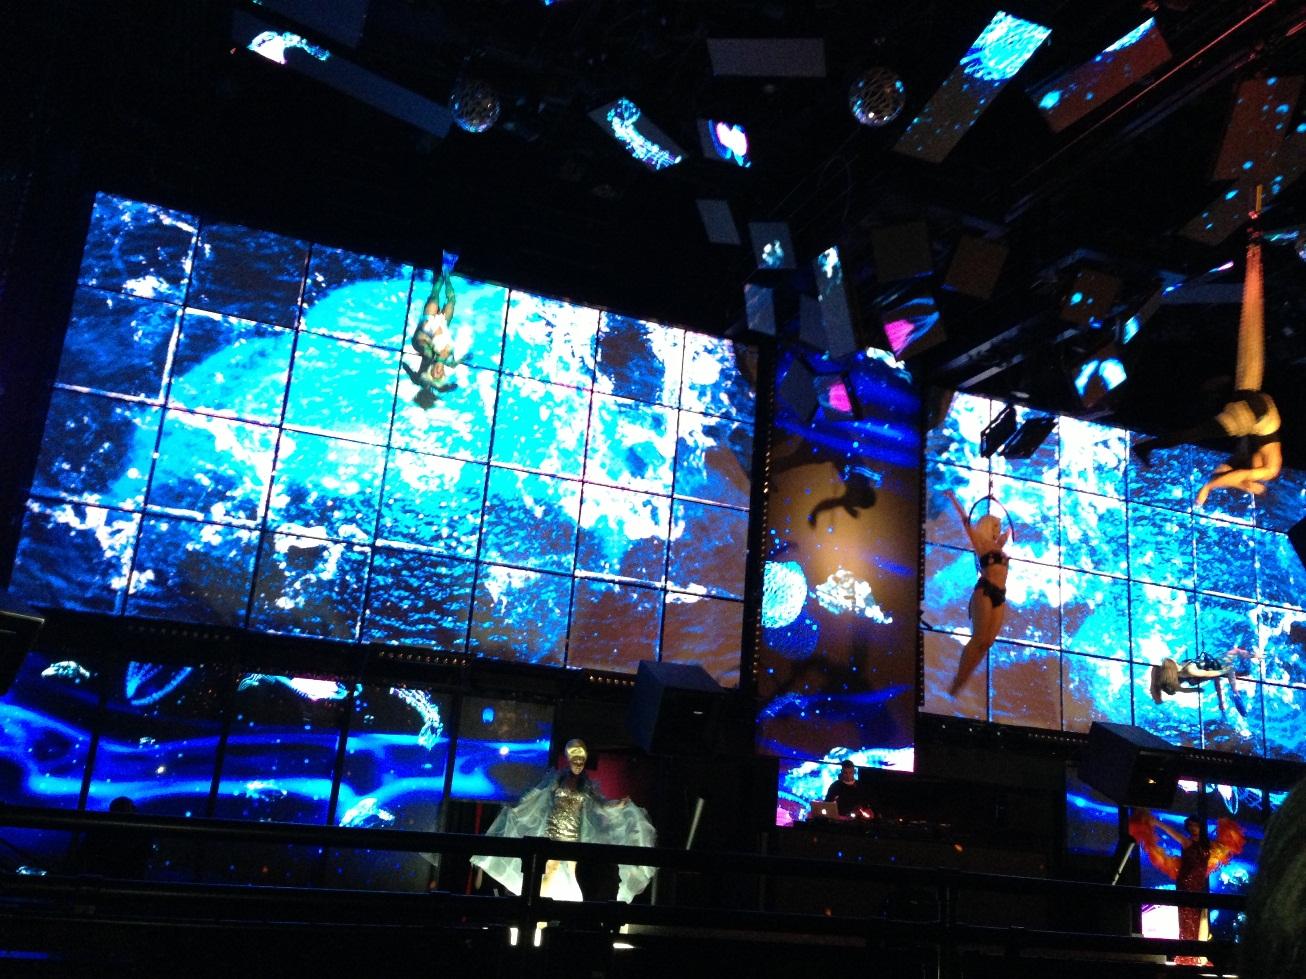 301 moved permanently - Licht nightclub ...